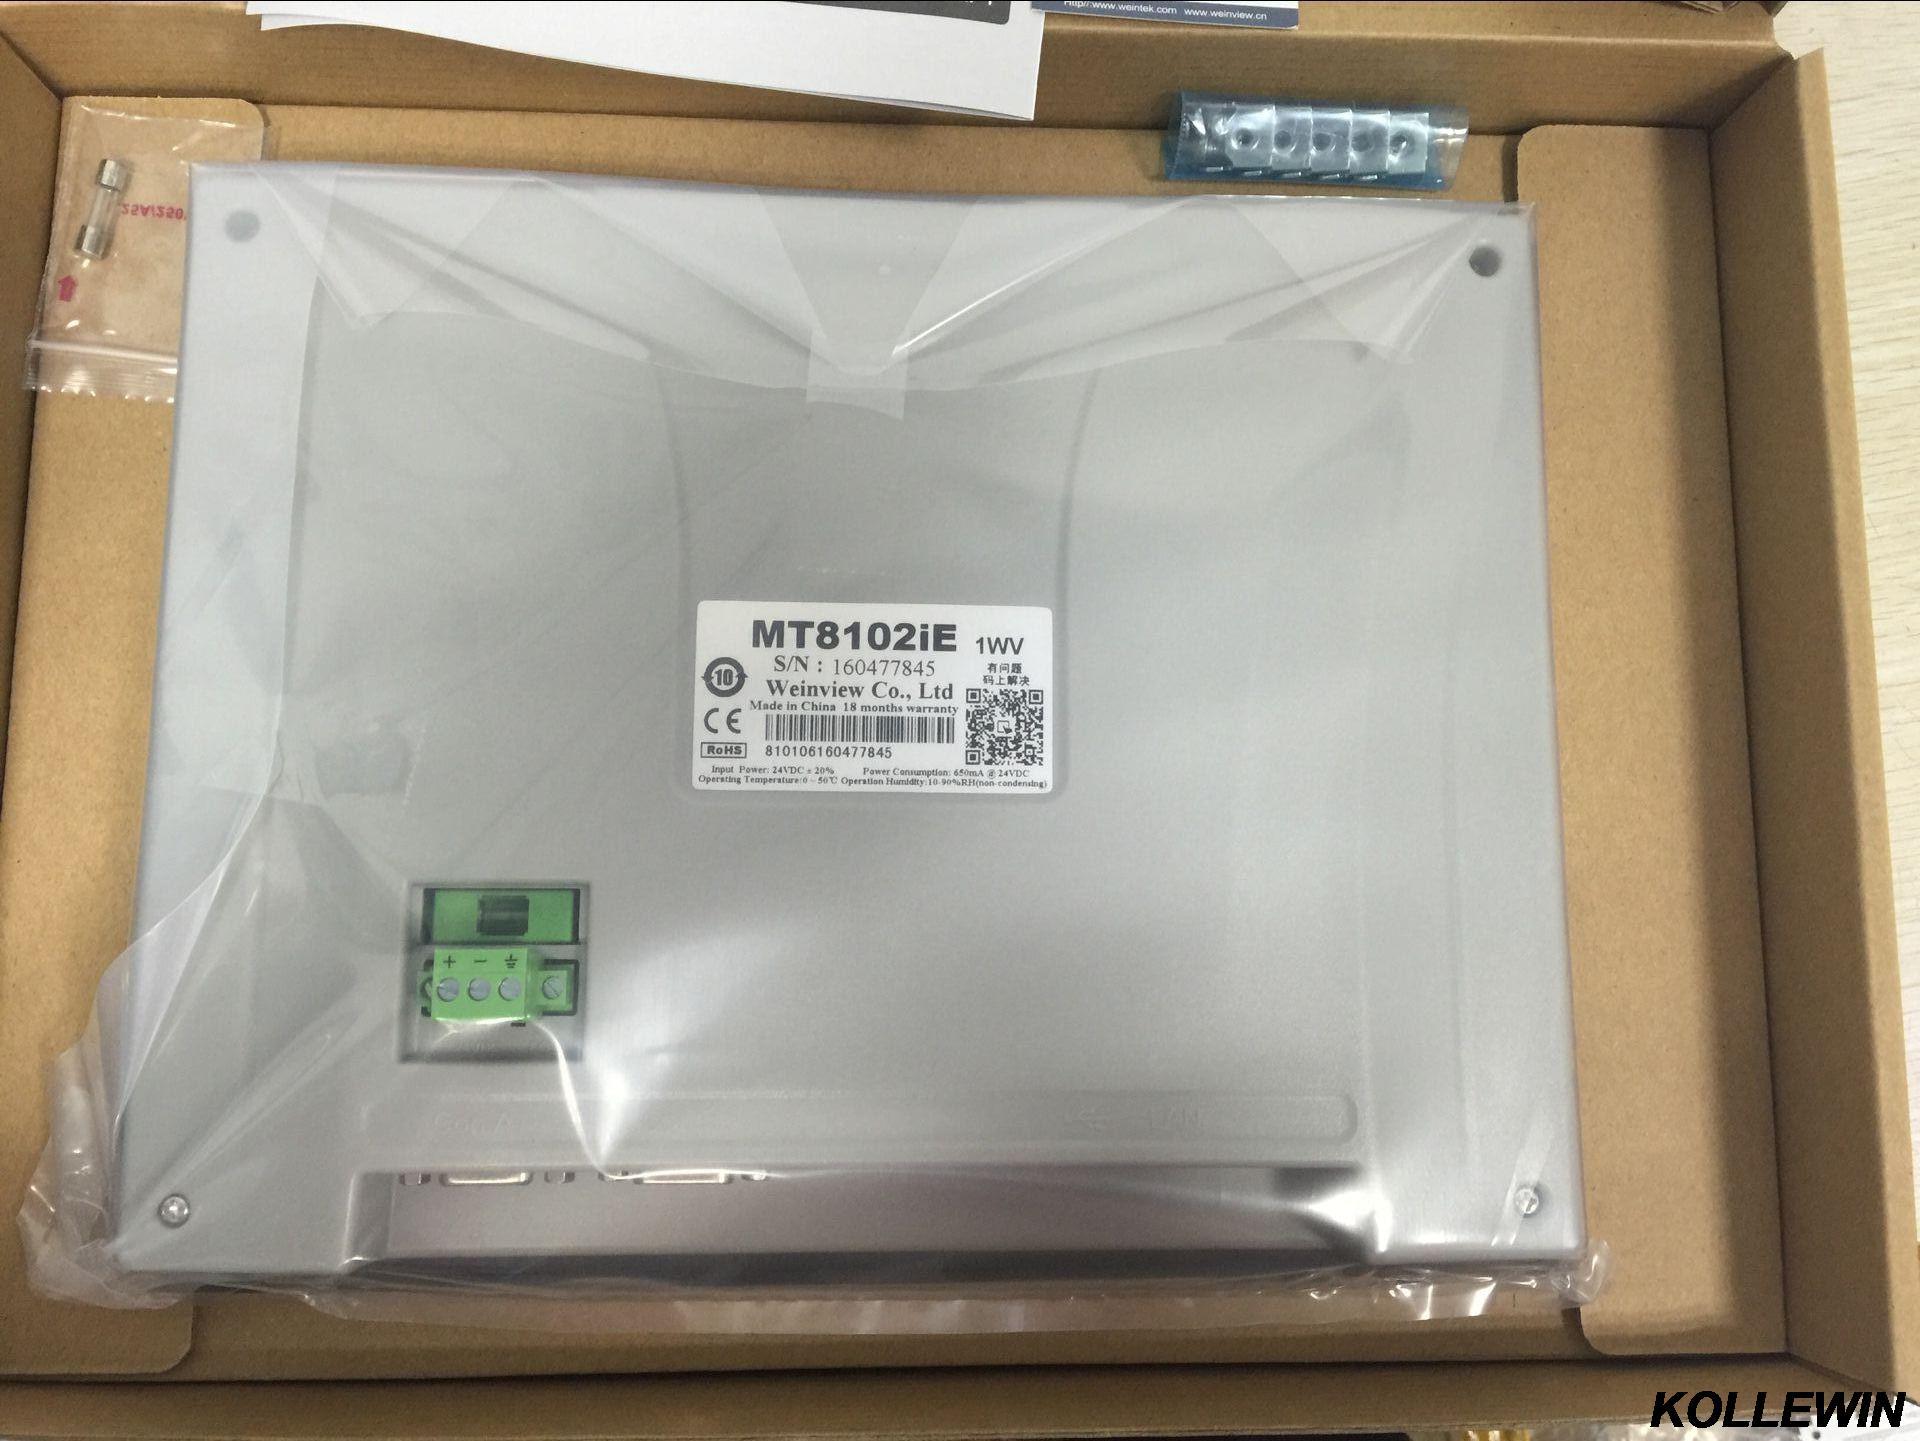 MT8102iE Novo original Weinview Weintek HMI 10.1 polegadas Touch Screen 1024x600 Ethernet substituir MT8101iE MT8100iE 1 ano de garantia